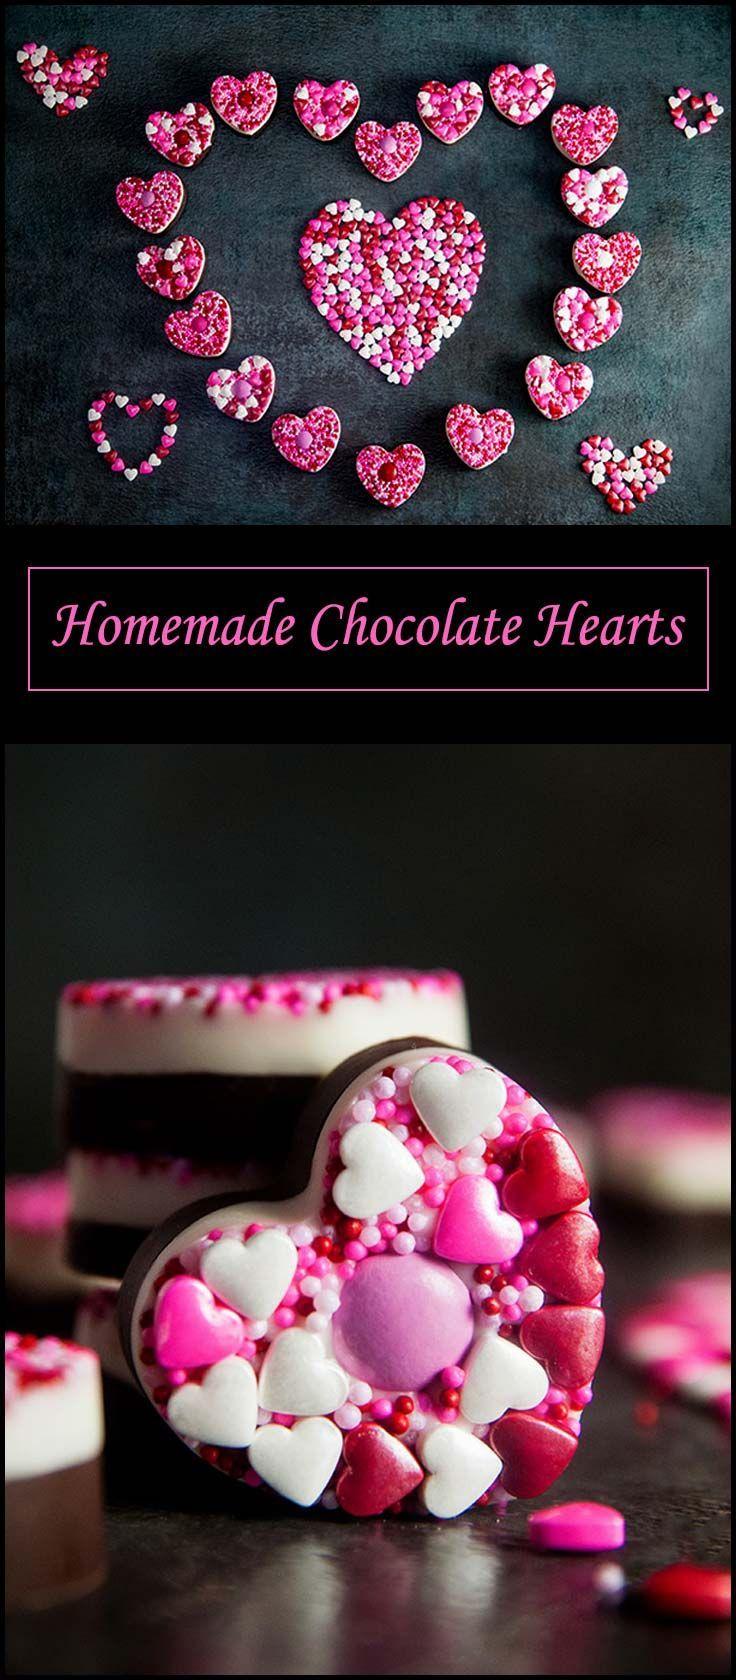 Homemade Chocolate Hearts from www.seasonedsprinkles.com